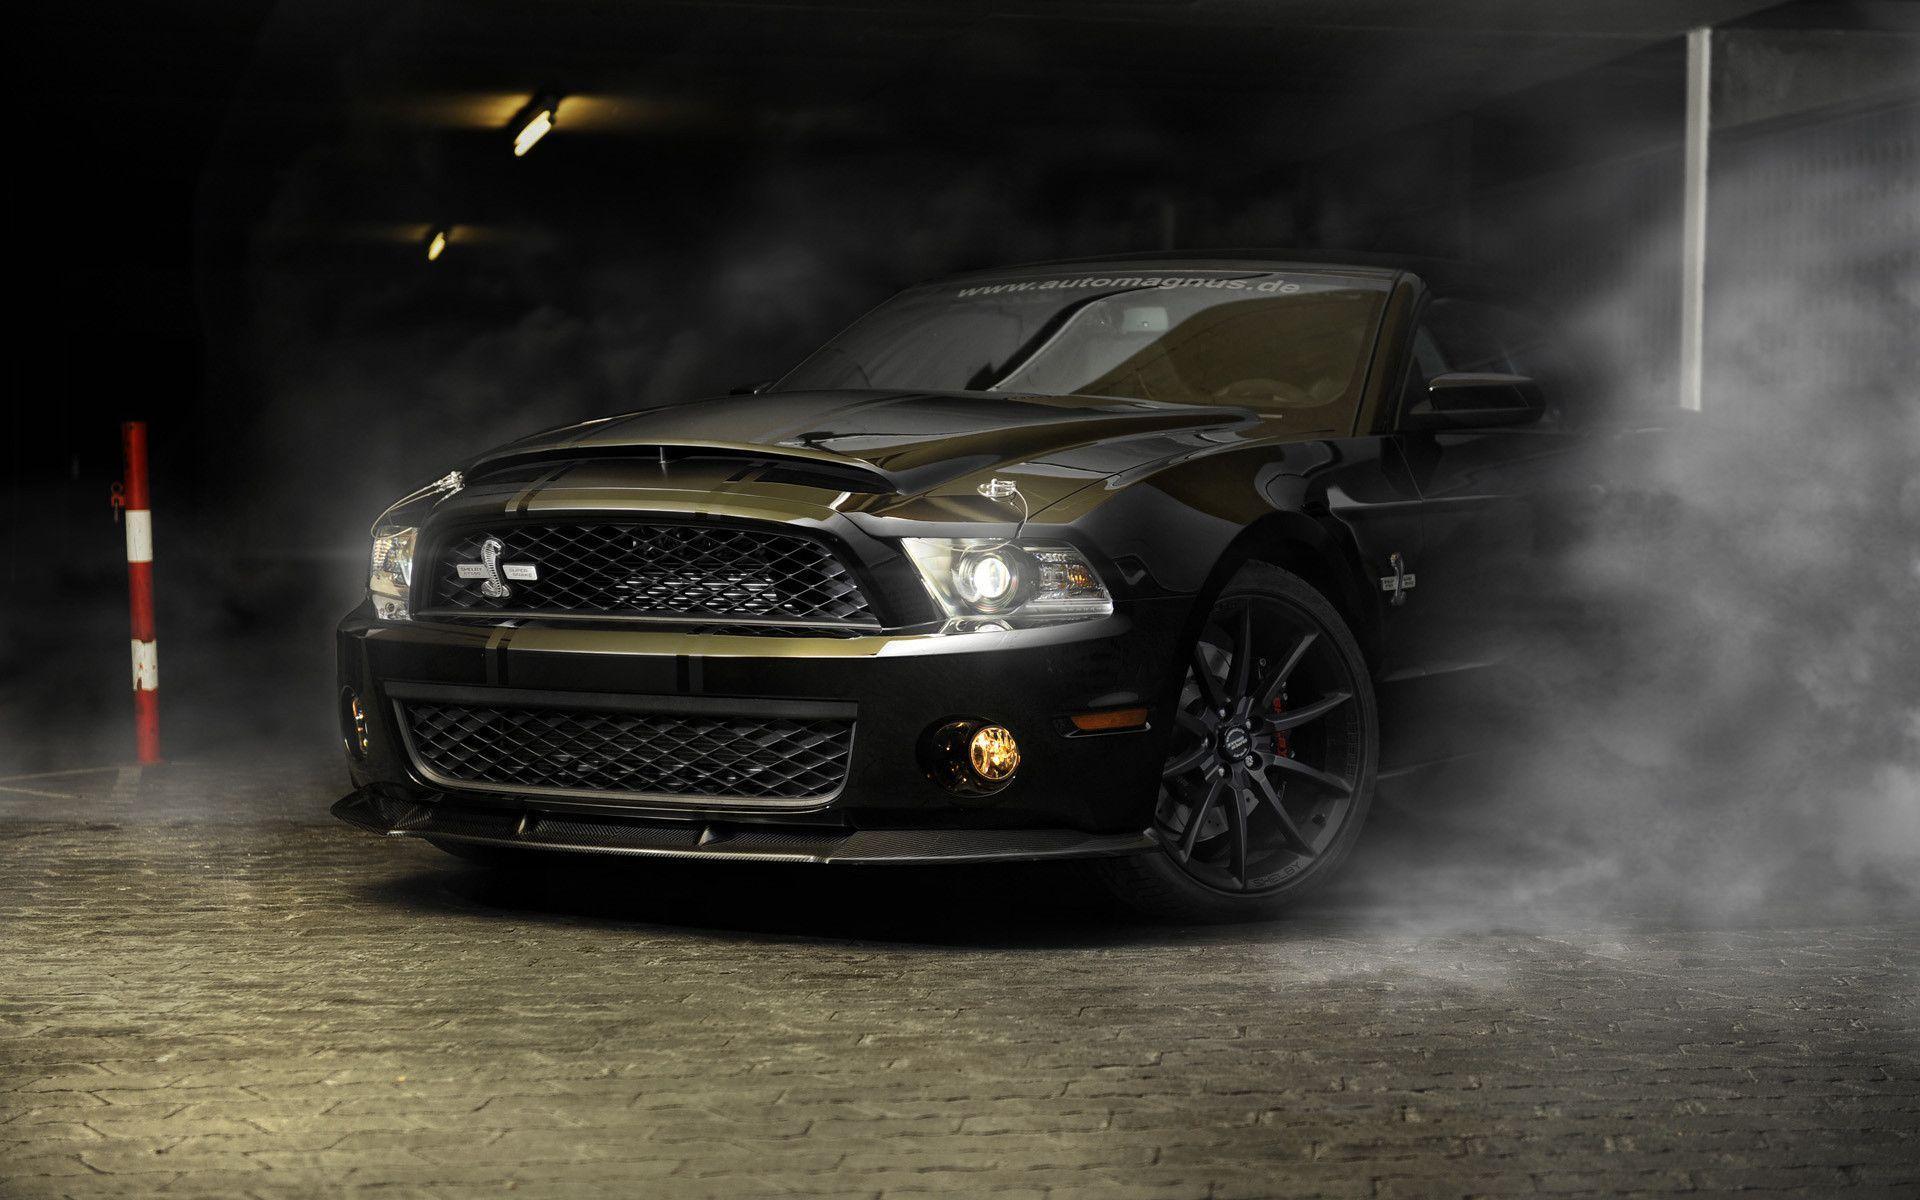 Mustang Wallpapers - Full HD wallpaper search